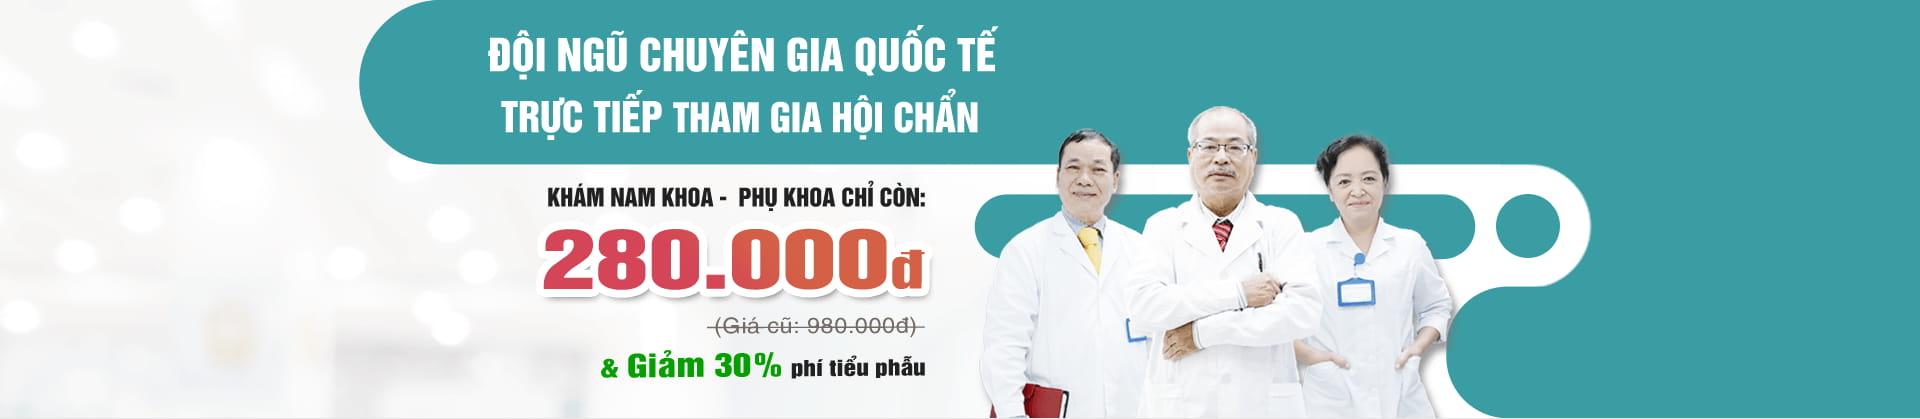 http://bit.ly/dakhoaonline